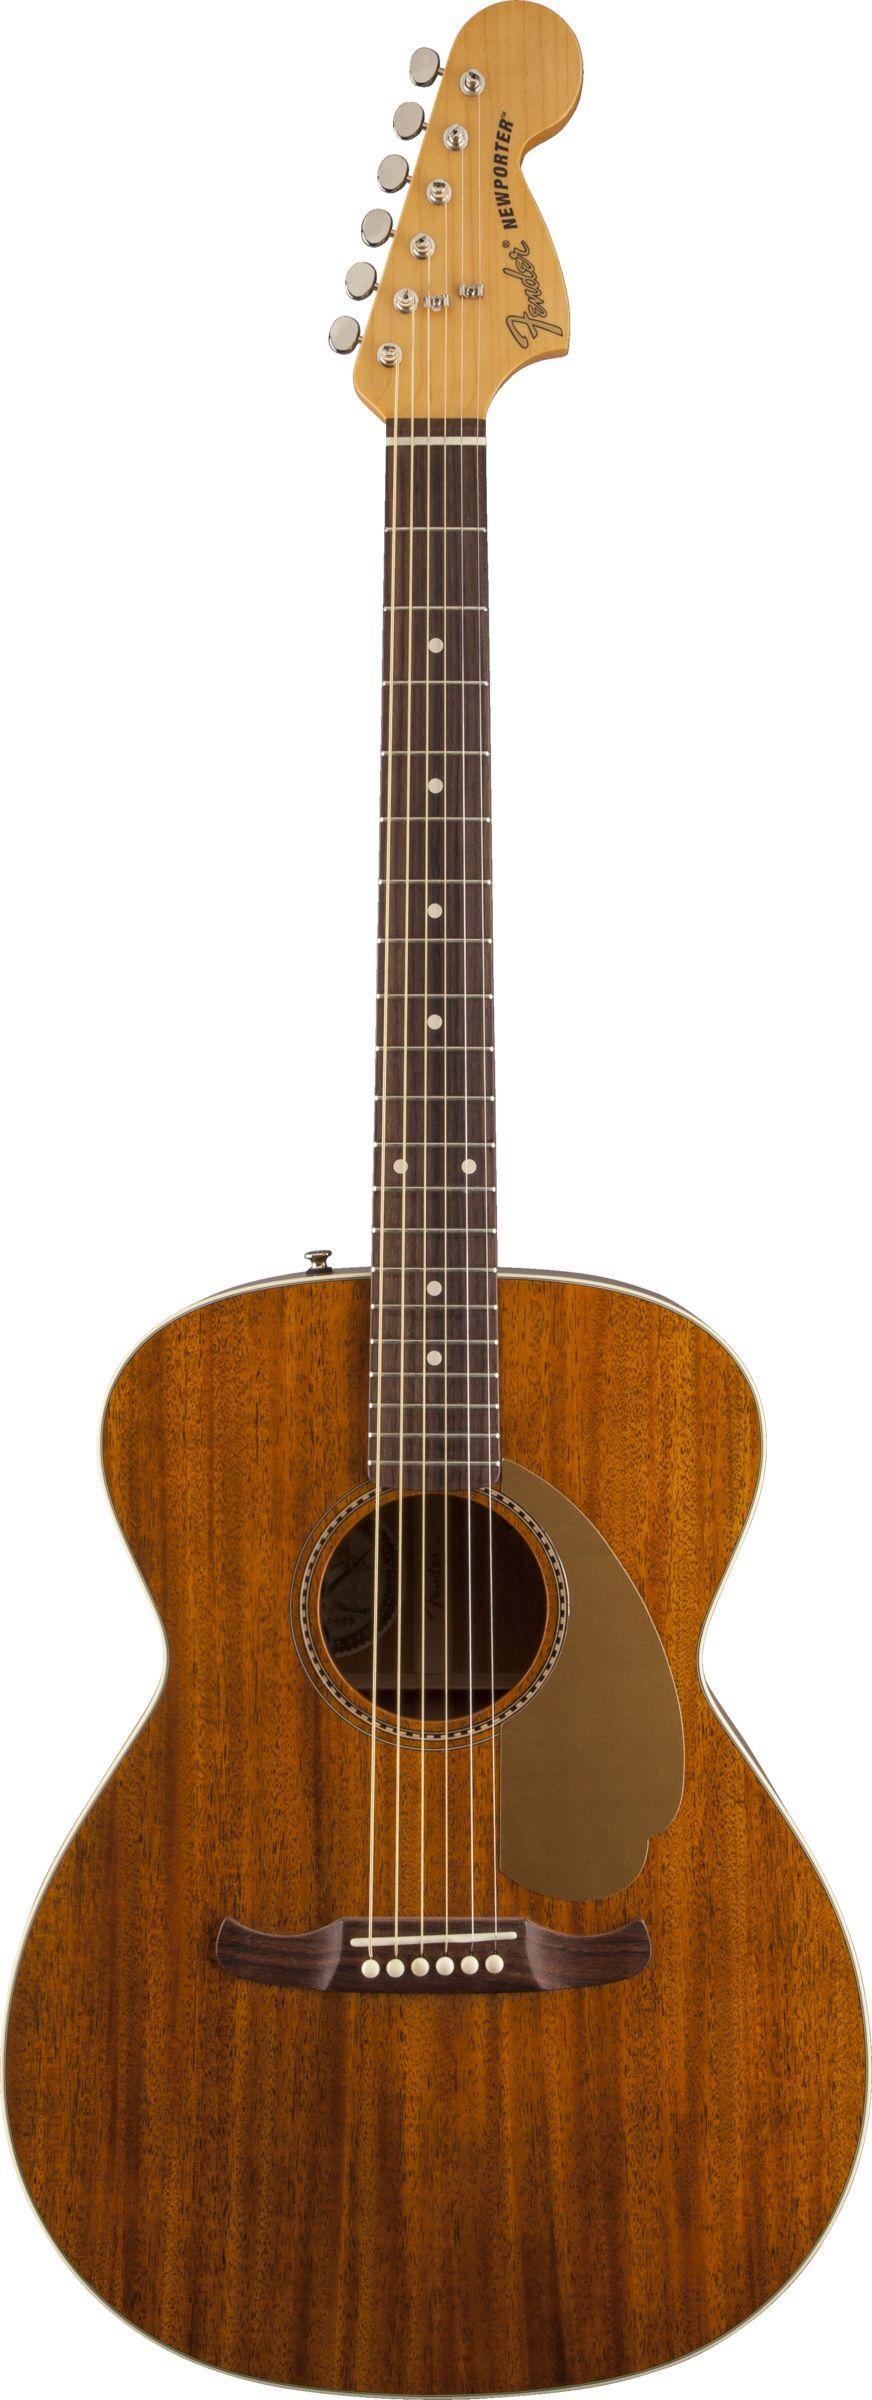 fender newporter pro custom bolt on guitars amplifiers fender acoustic electric guitar. Black Bedroom Furniture Sets. Home Design Ideas